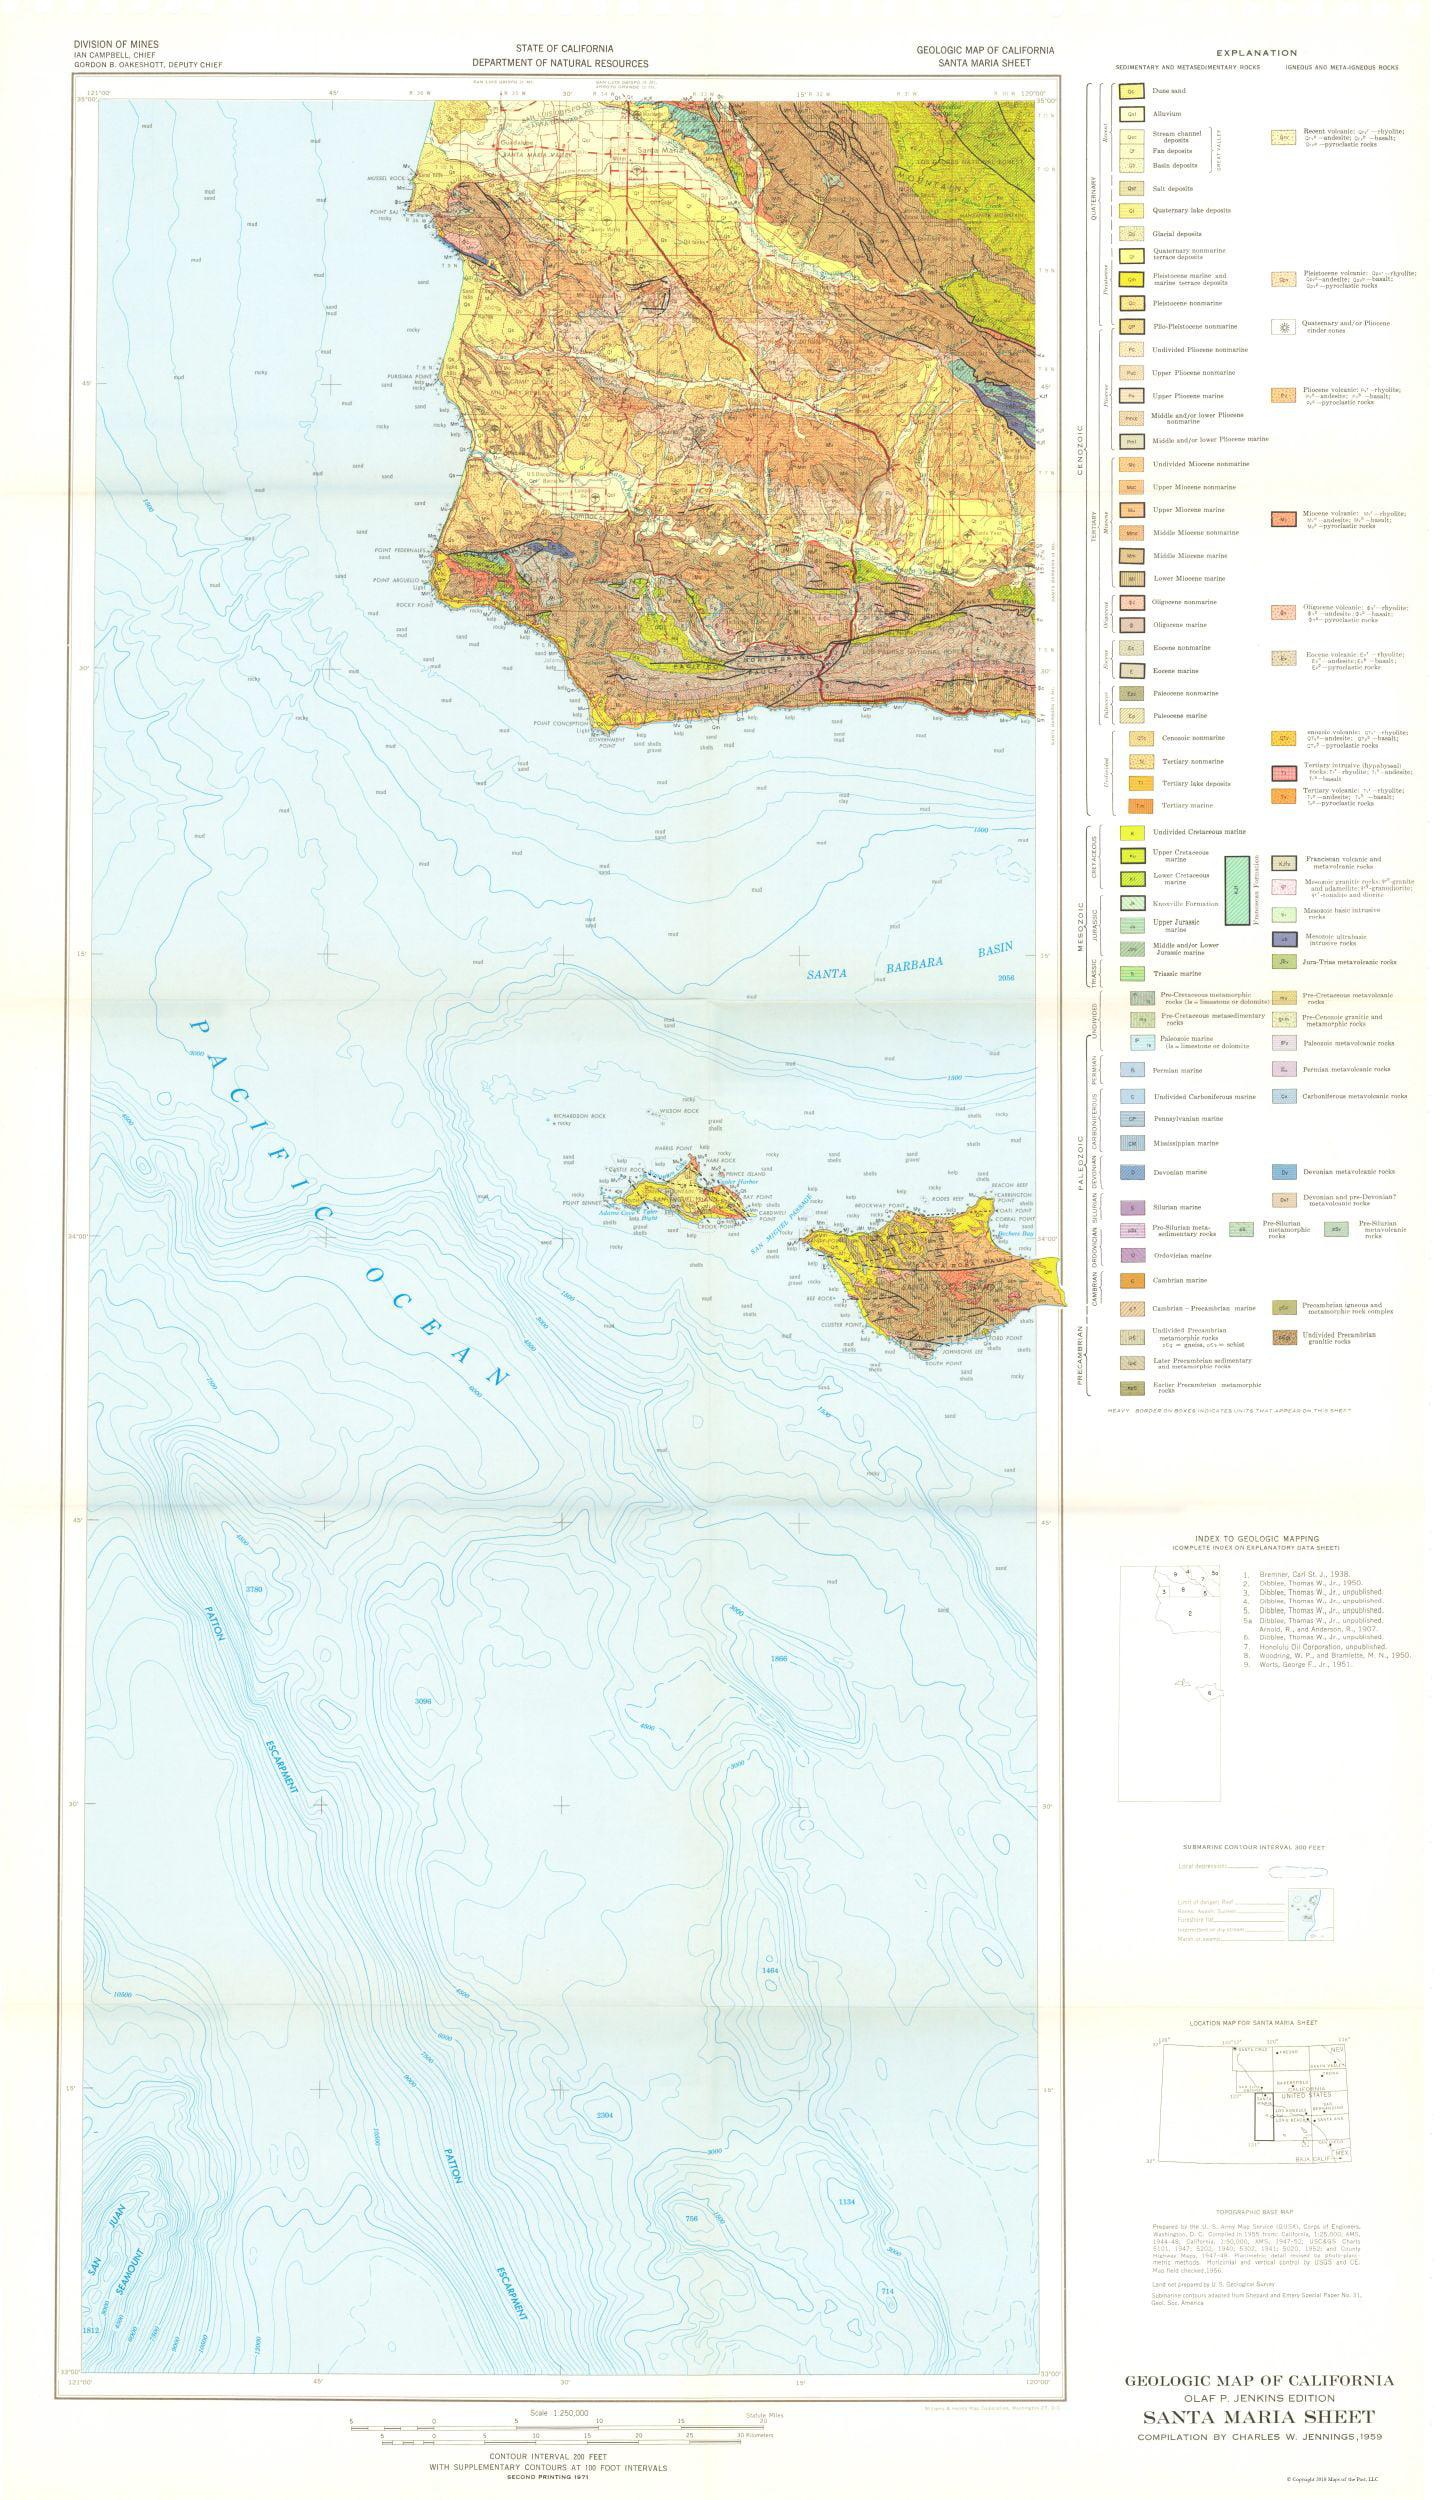 Santa Maria California Map on arroyo grande california map, mckittrick california map, alamitos california map, san bernardo california map, sonoma coast california map, camarillo california map, stevinson california map, loyalton california map, refugio beach california map, ventura california map, morro bay california map, central coast california map, valencia california map, san nicolas island california map, cardiff by the sea california map, mission santa barbara california map, garey california map, buellton ca map, westlake village california map, stockton california map,